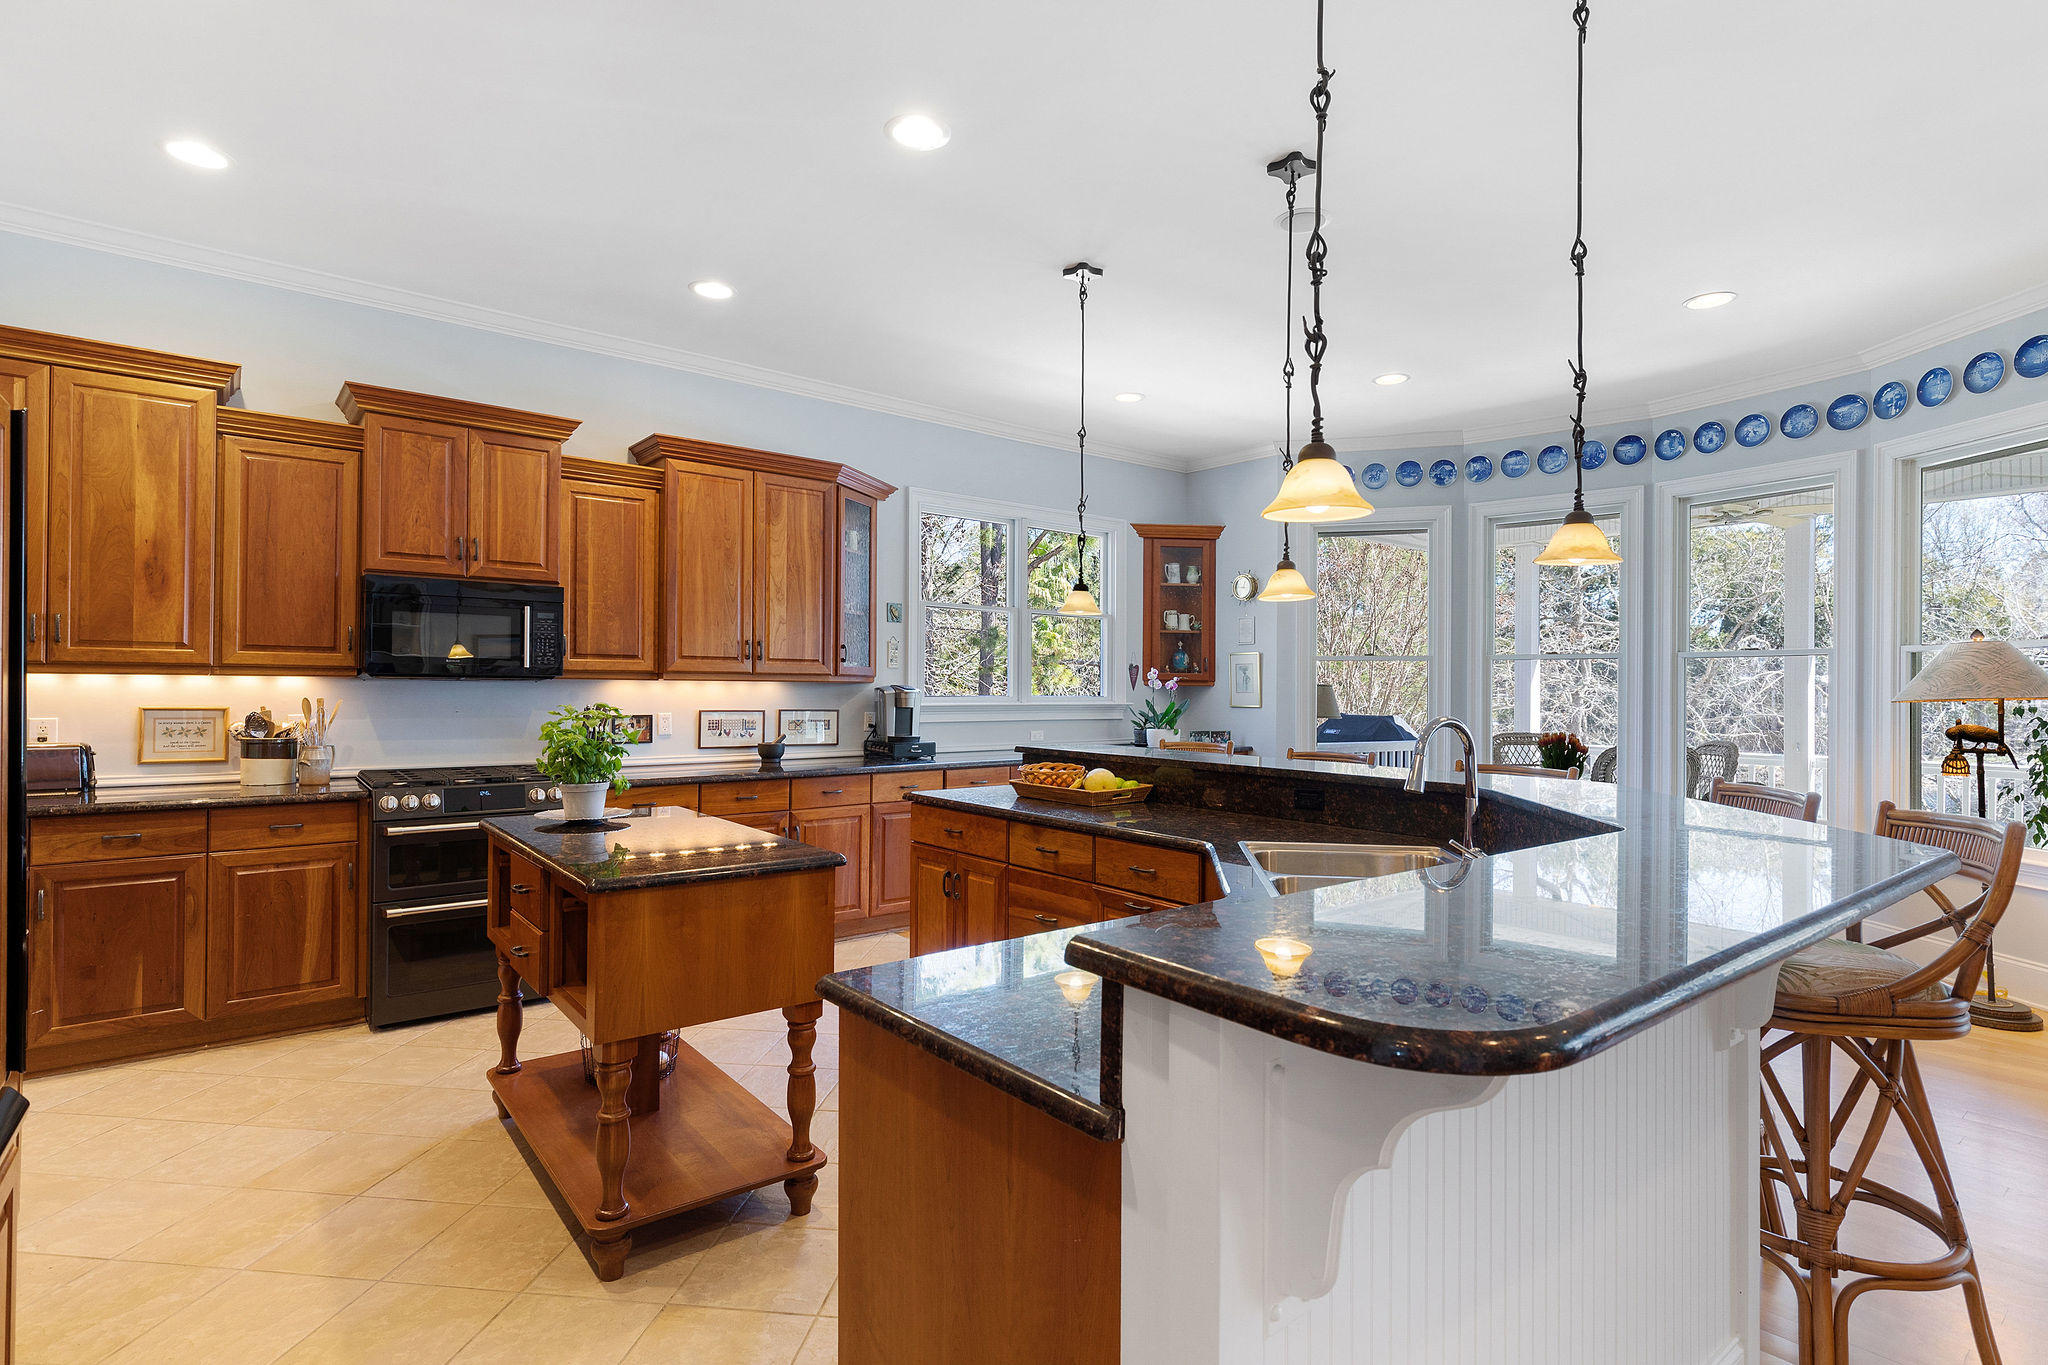 Back Bay Village Homes For Sale - 244 Indigo Bay Circle, Mount Pleasant, SC - 92